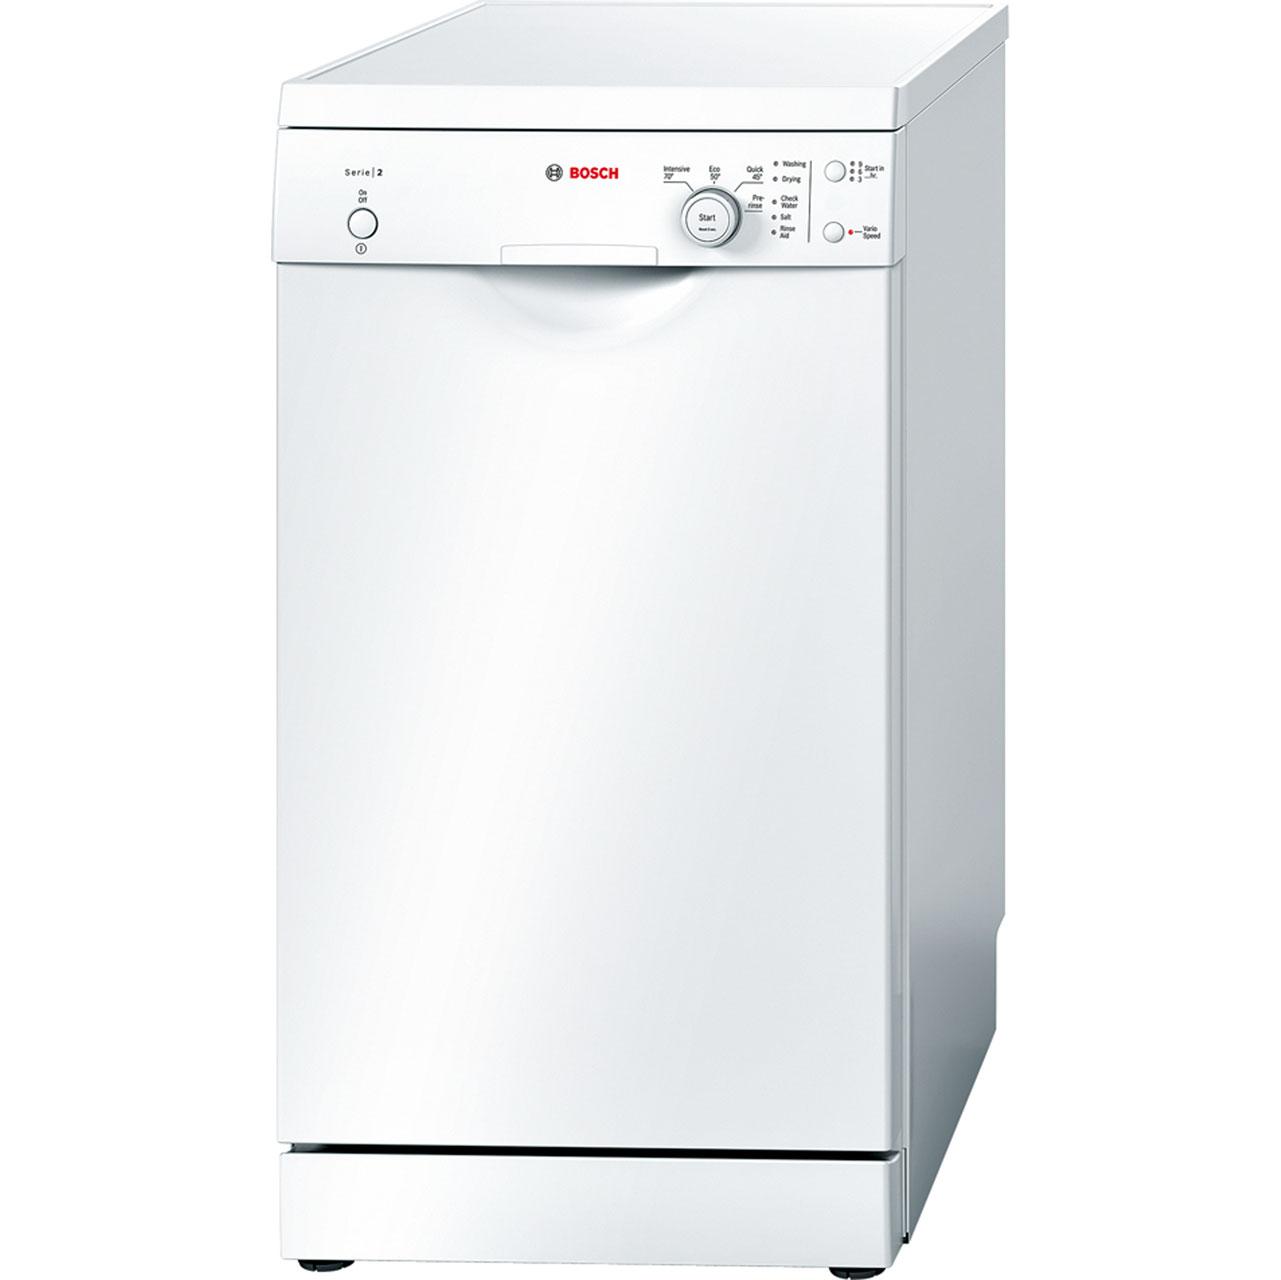 Image of Bosch Serie 2 SPS40E32GB Free Standing Slimline Dishwasher in White